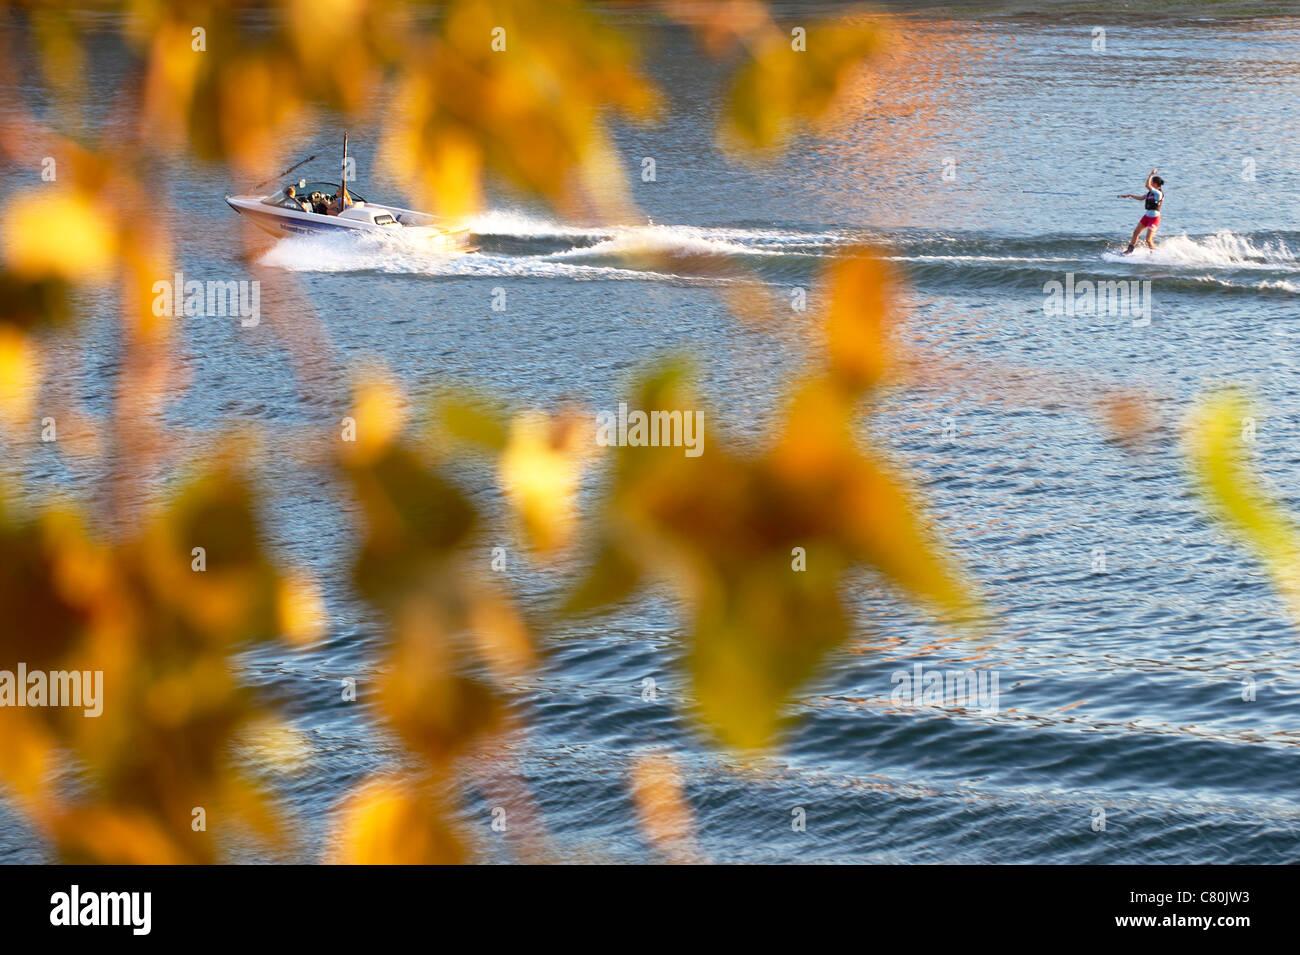 France, Haute-Garonne, Toulouse, Garonne River, Water Ski - Stock Image